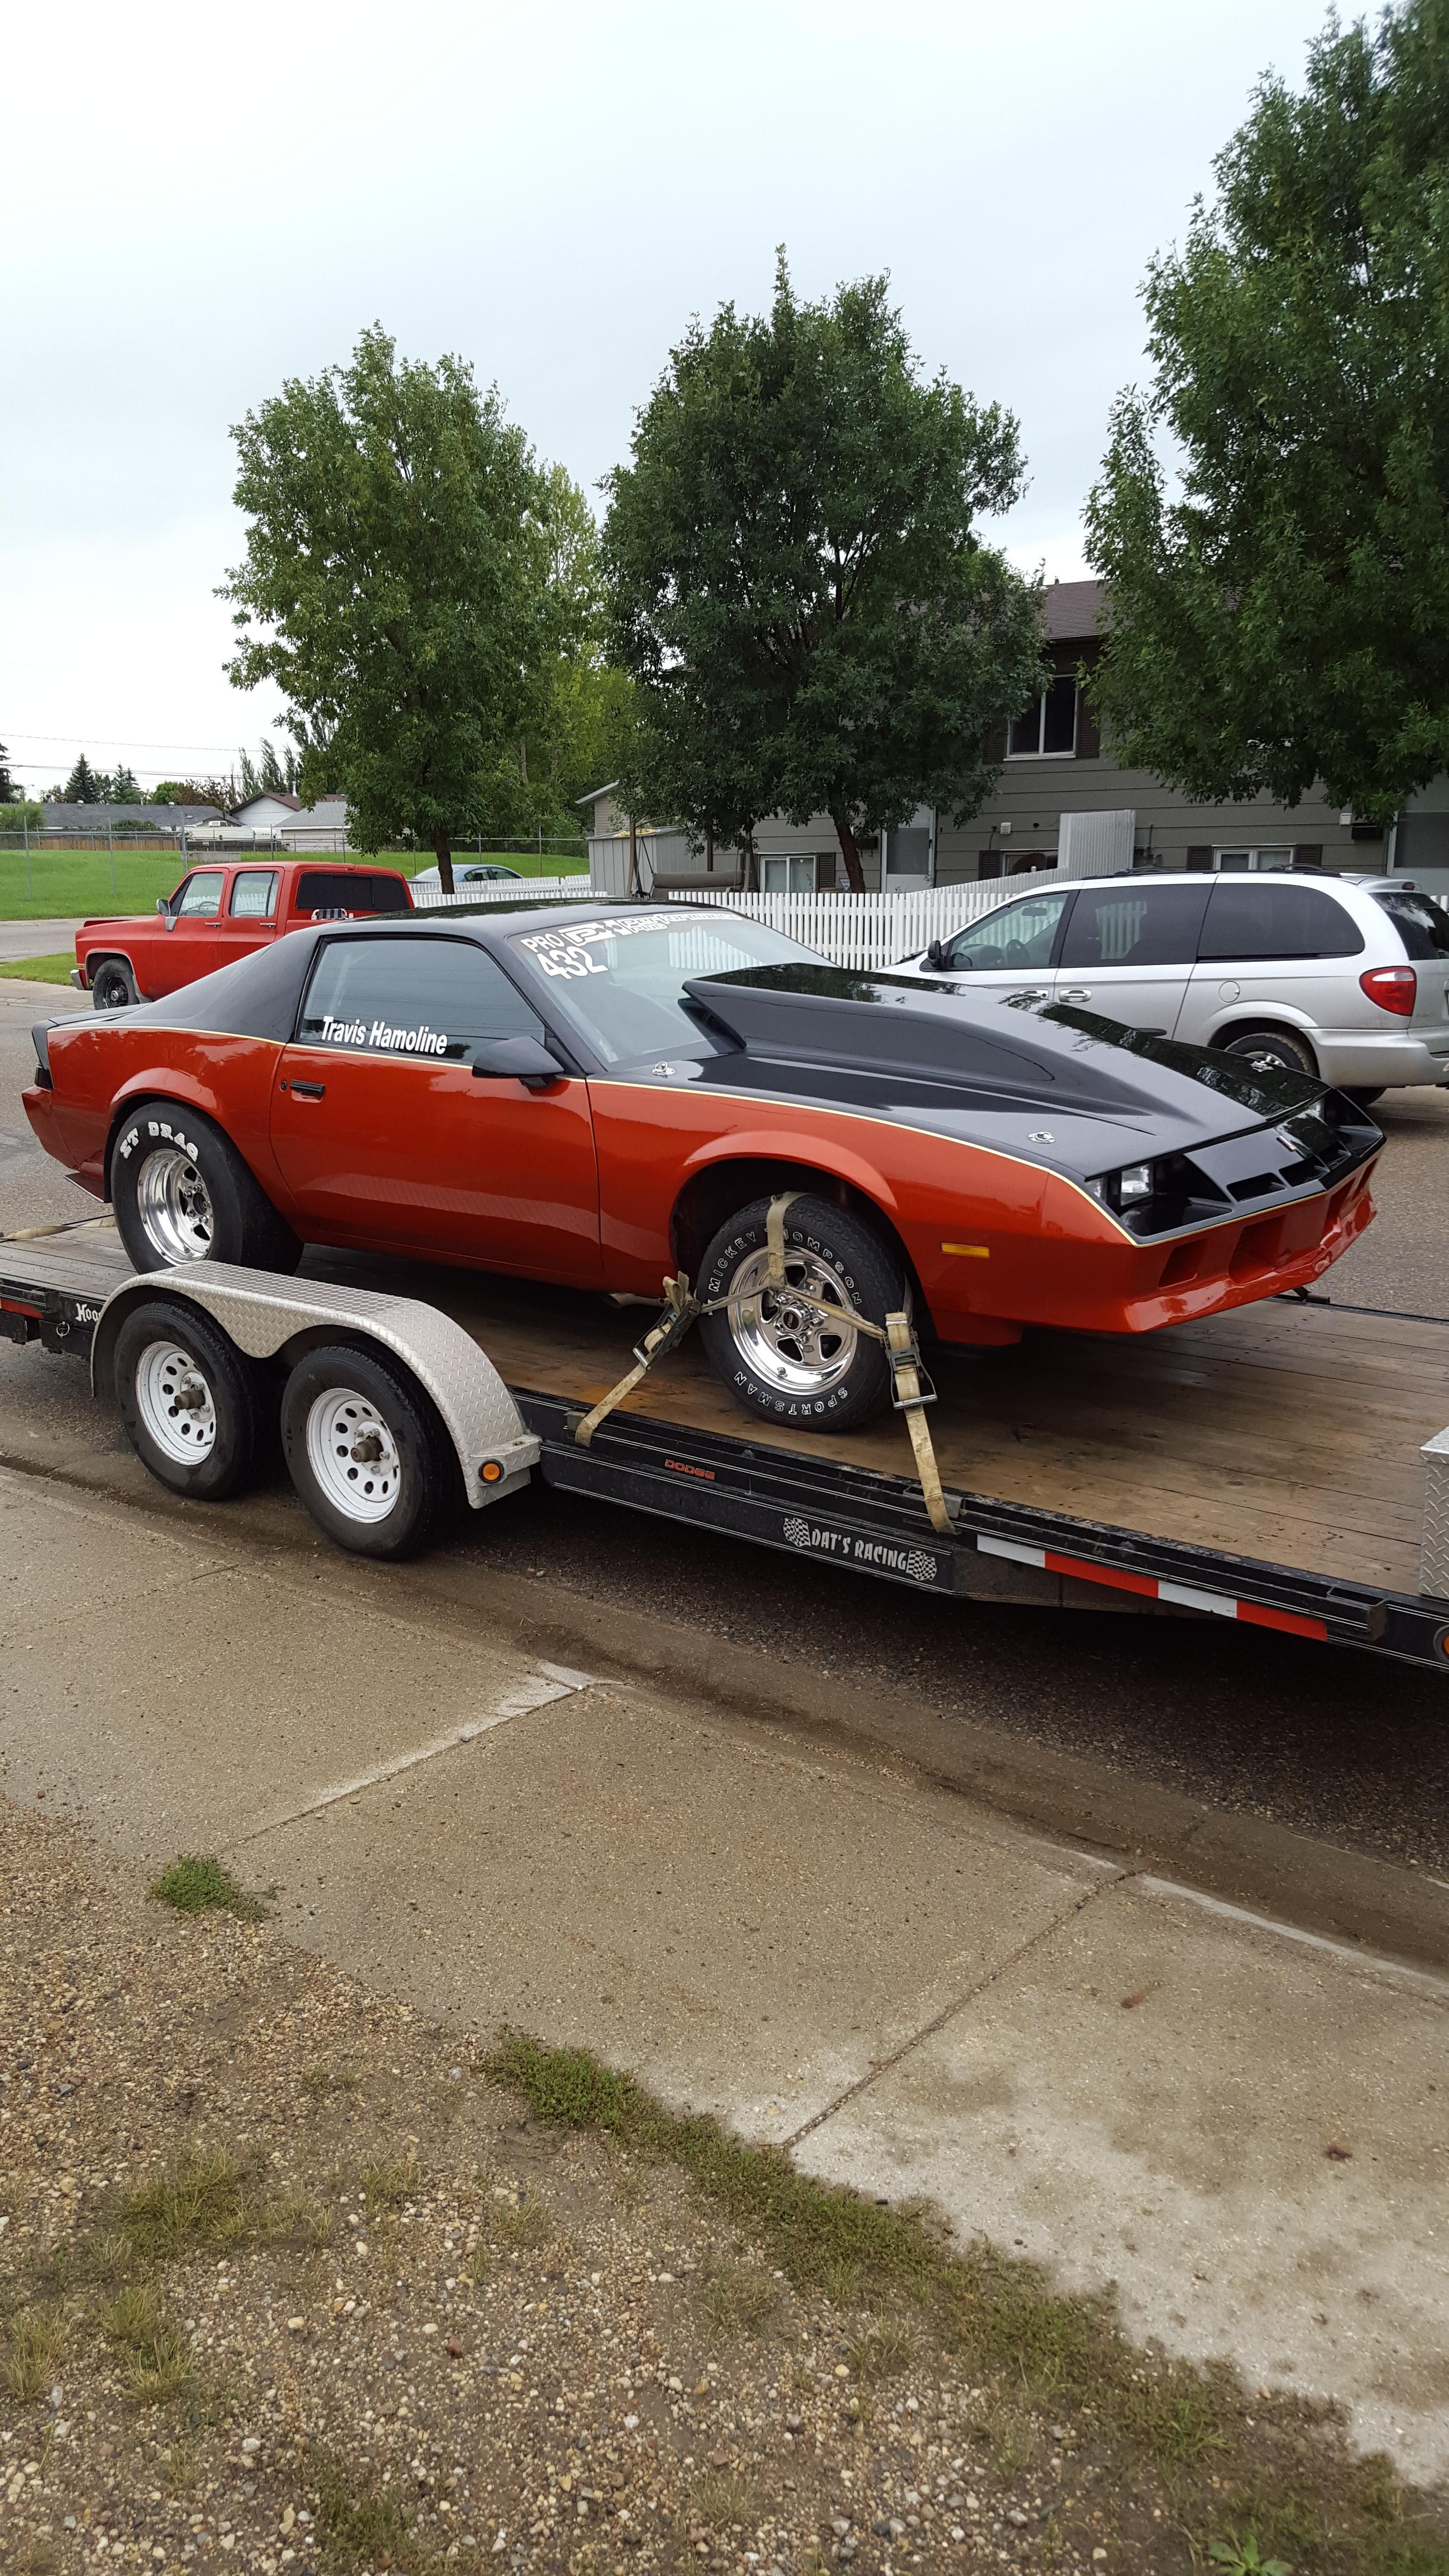 Go Karts Colorado Springs >> 1984 Camaro Drag Car For Sale - $18000